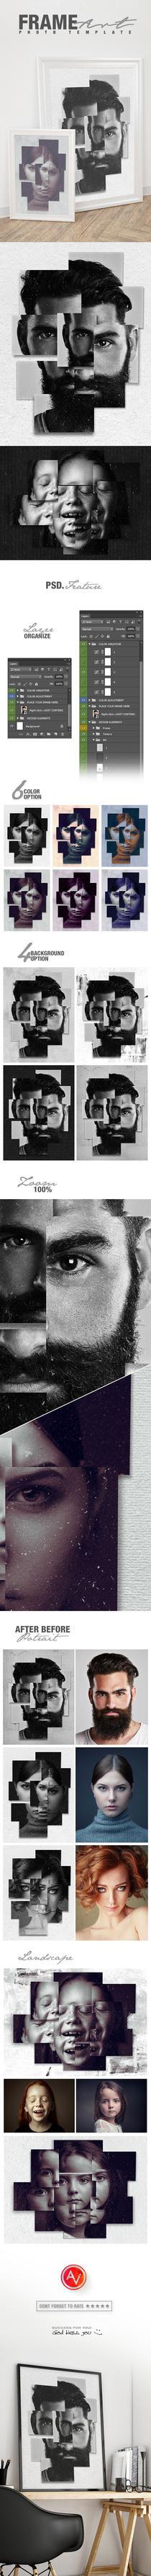 Frame Art Photo Template by amorjesu